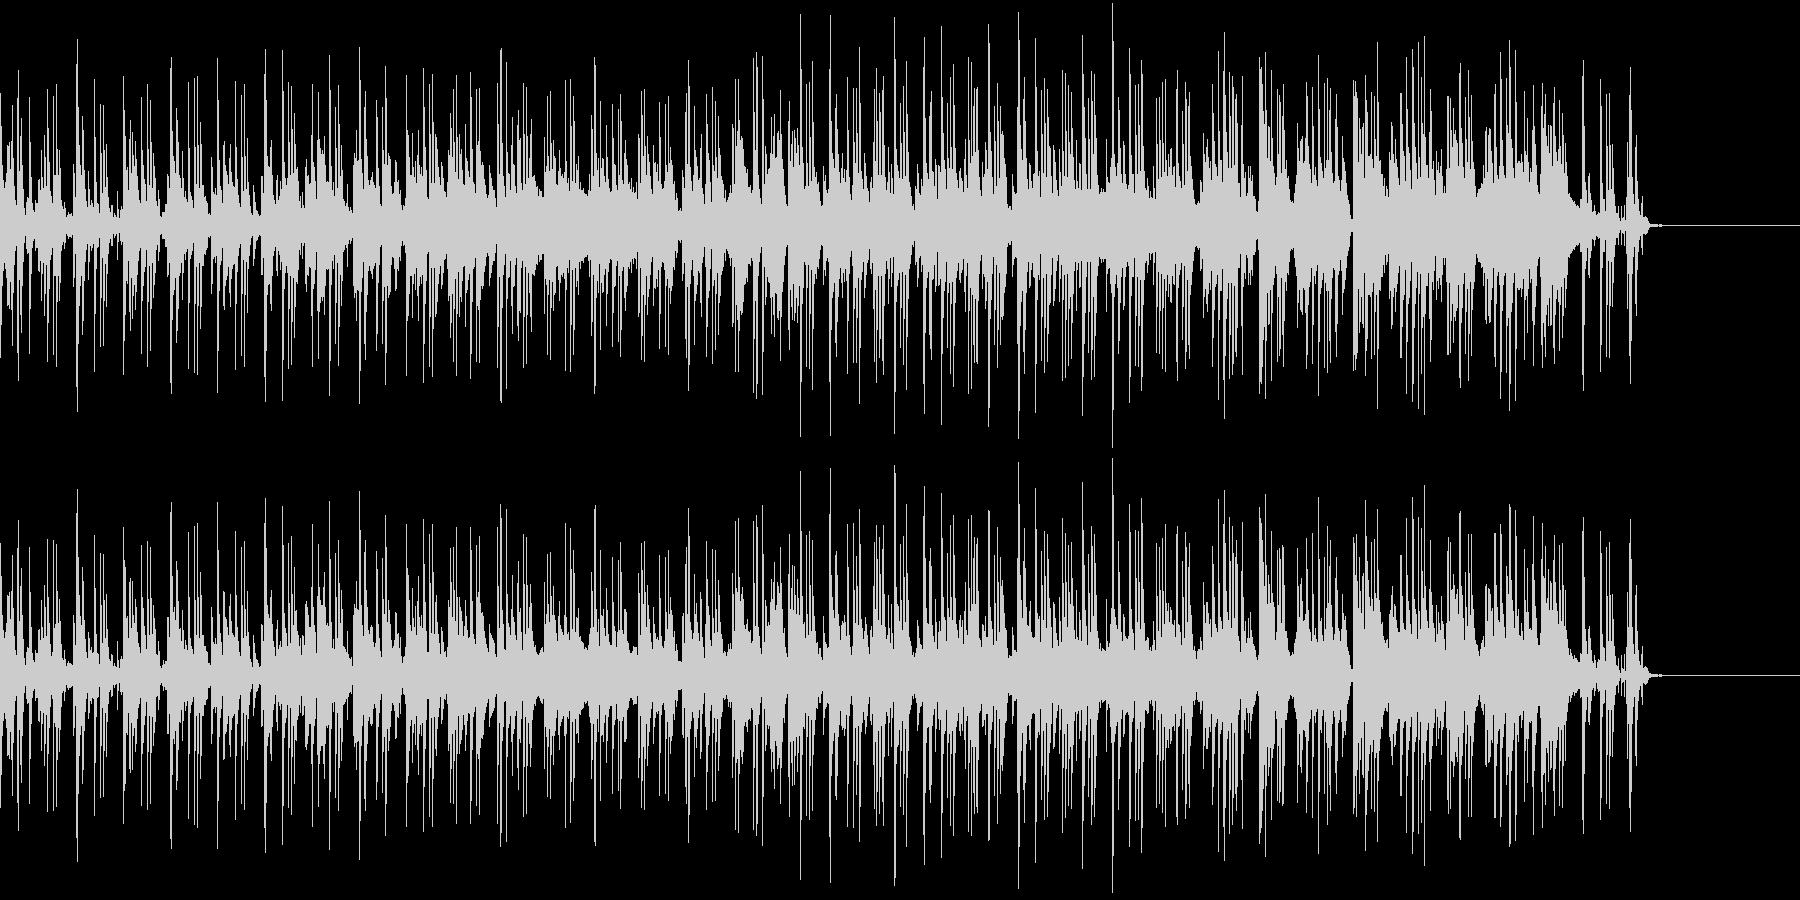 Jazzのピアノトリオ編成の速い曲ですの未再生の波形